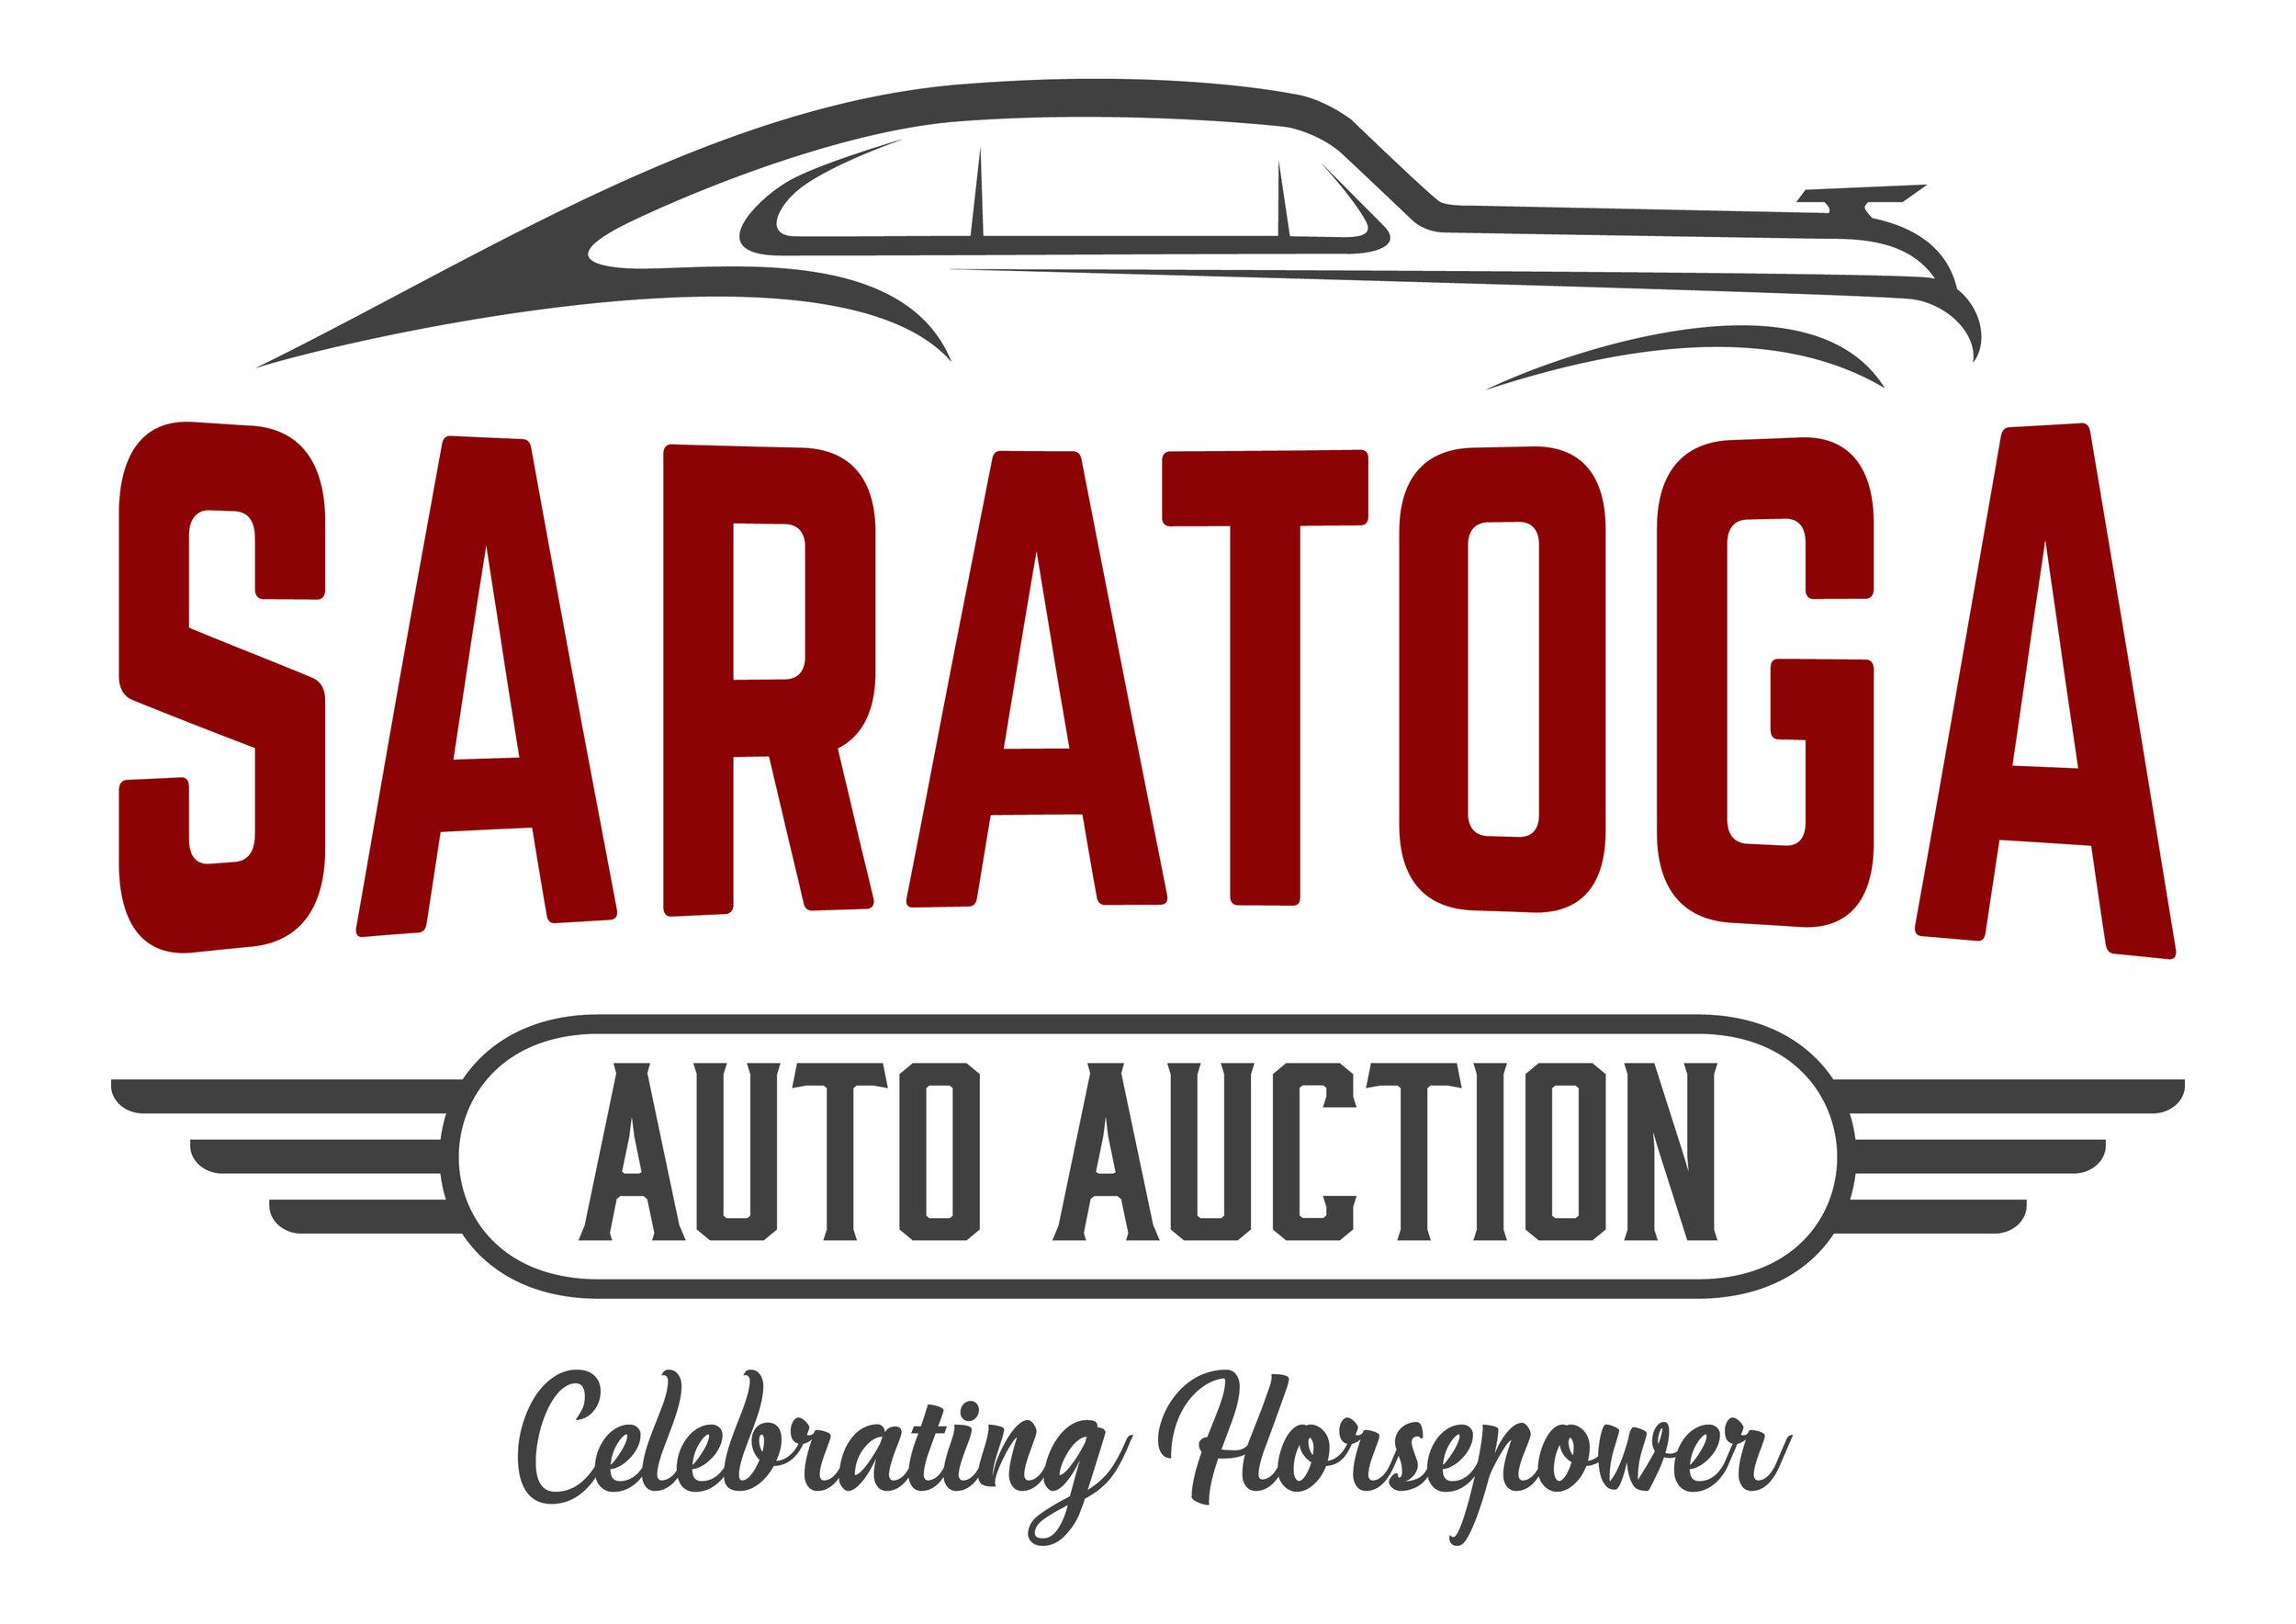 Saratoga Auto auction logo - revised.jpg